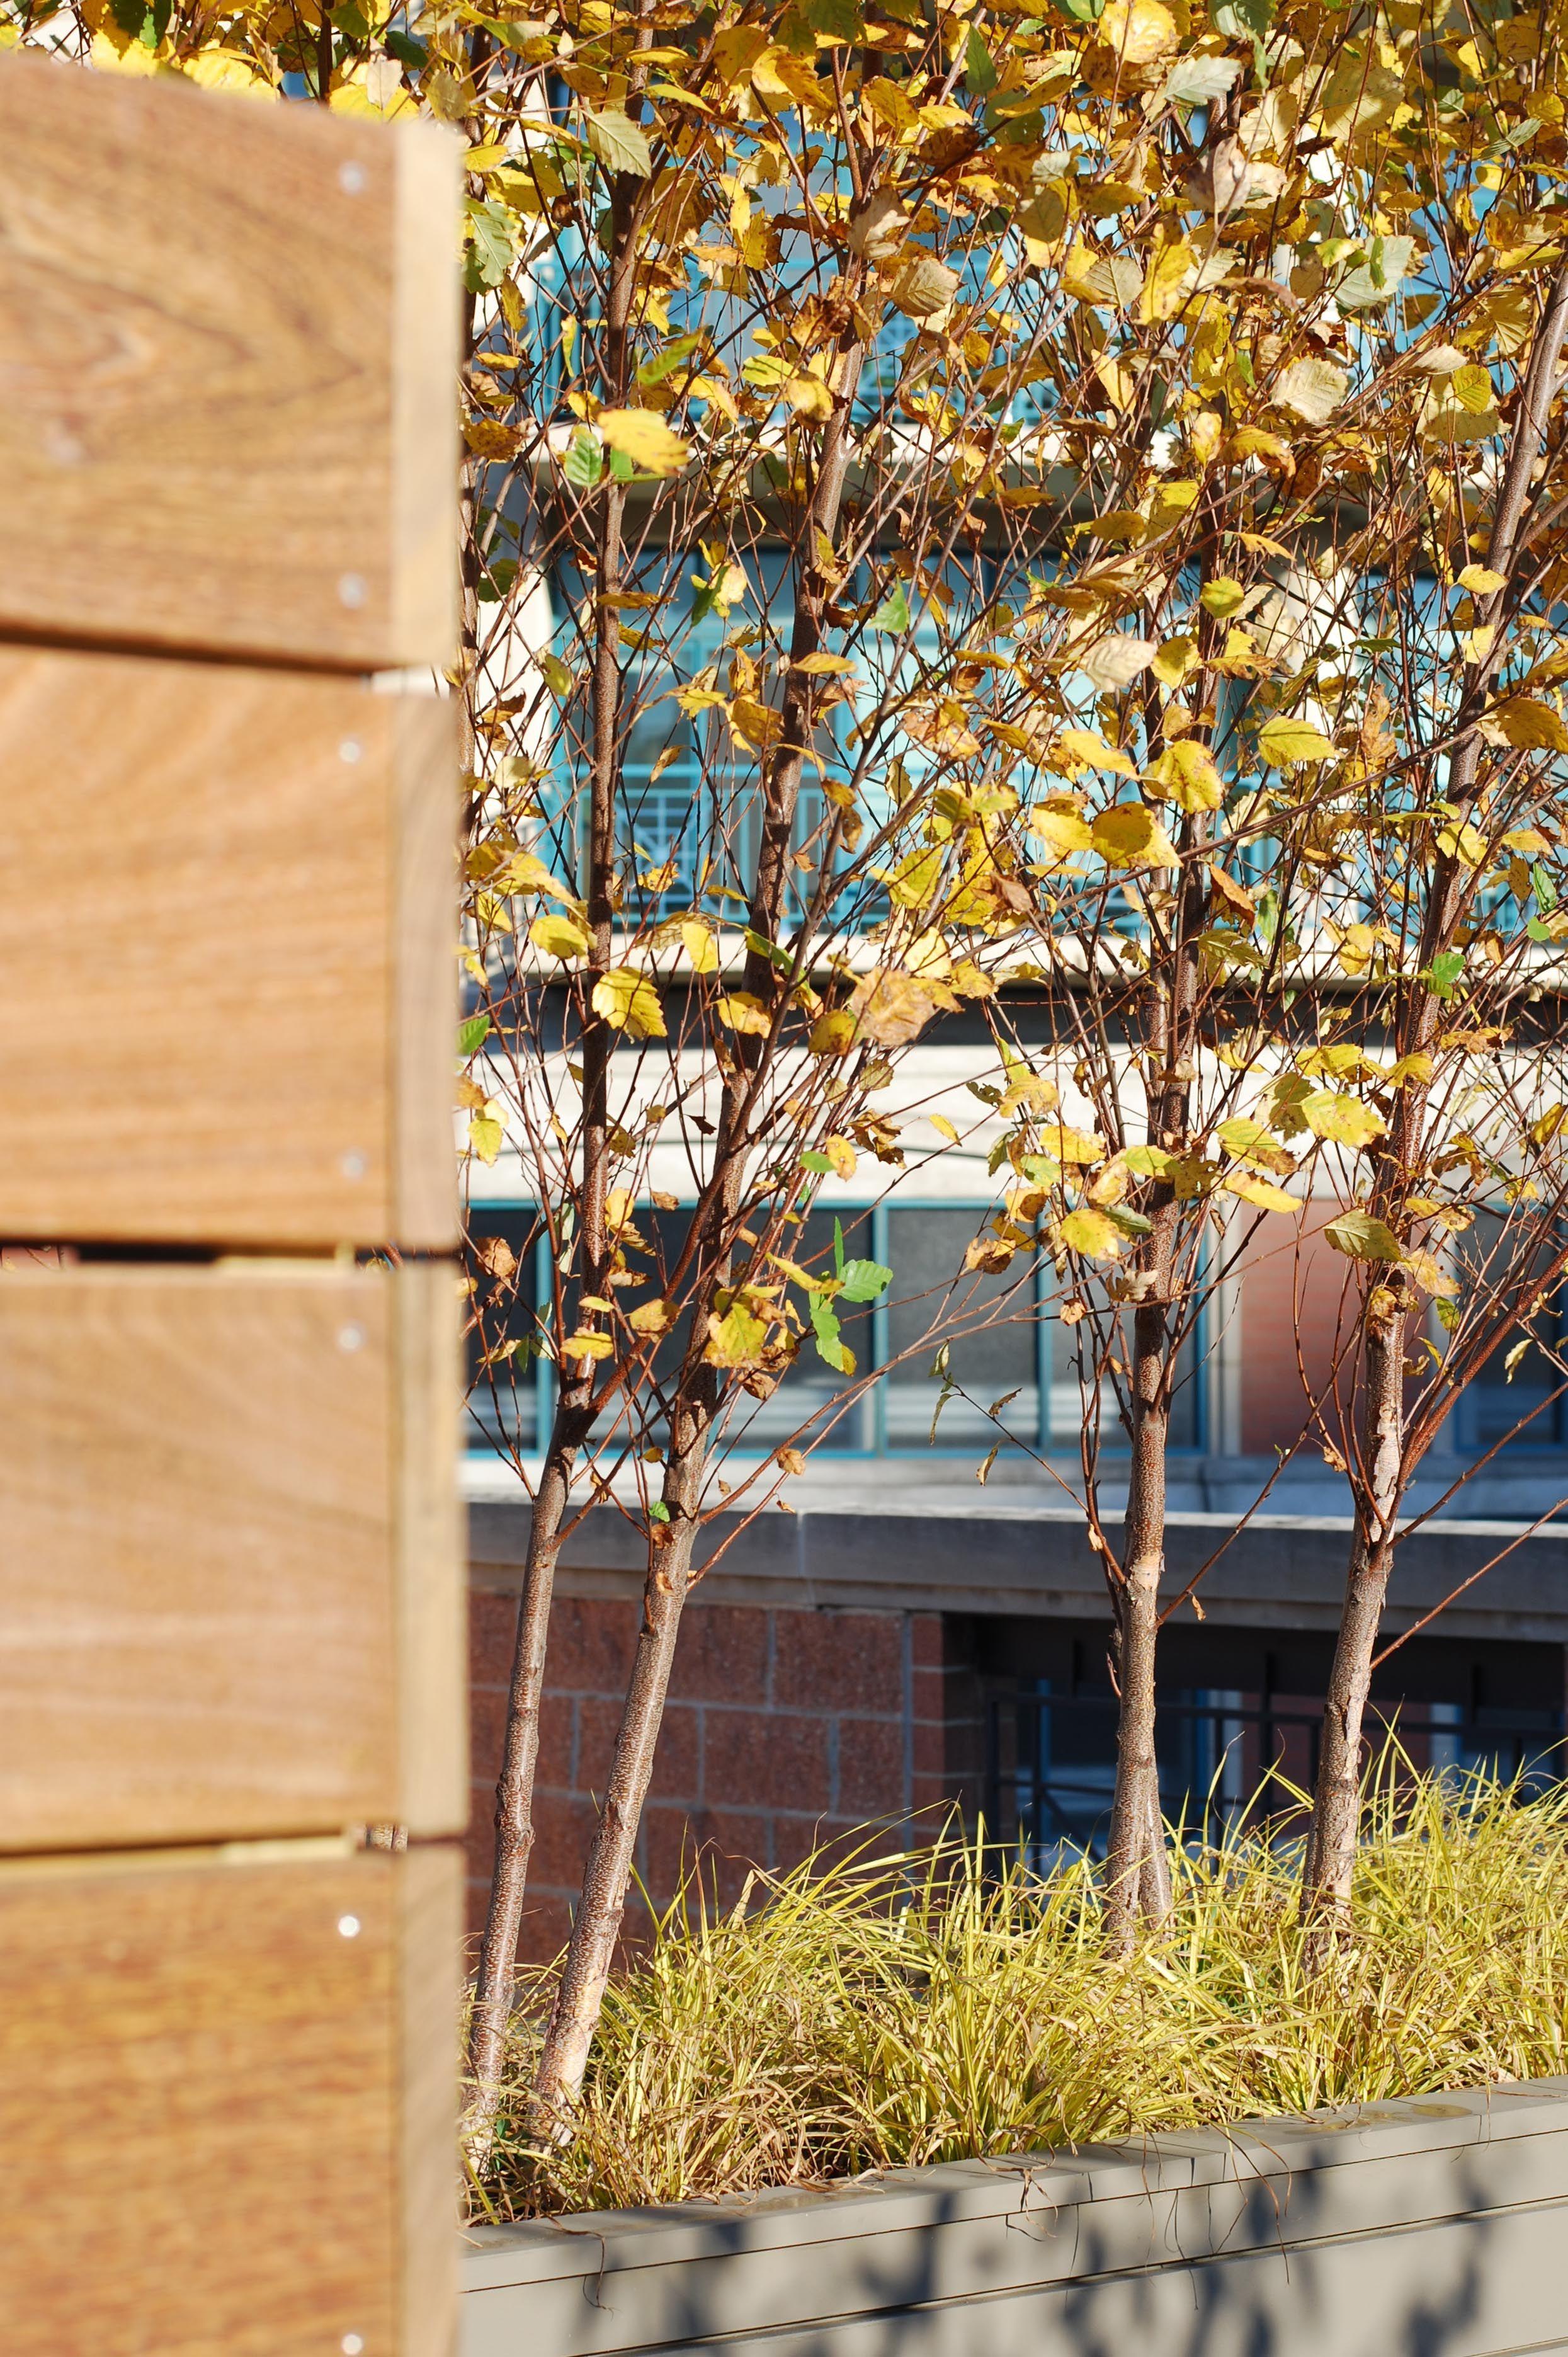 Upper Deck   Roof Deck   Urban   Garden   Landscape Design   Fall   Birch Trees   Containers   Ipe